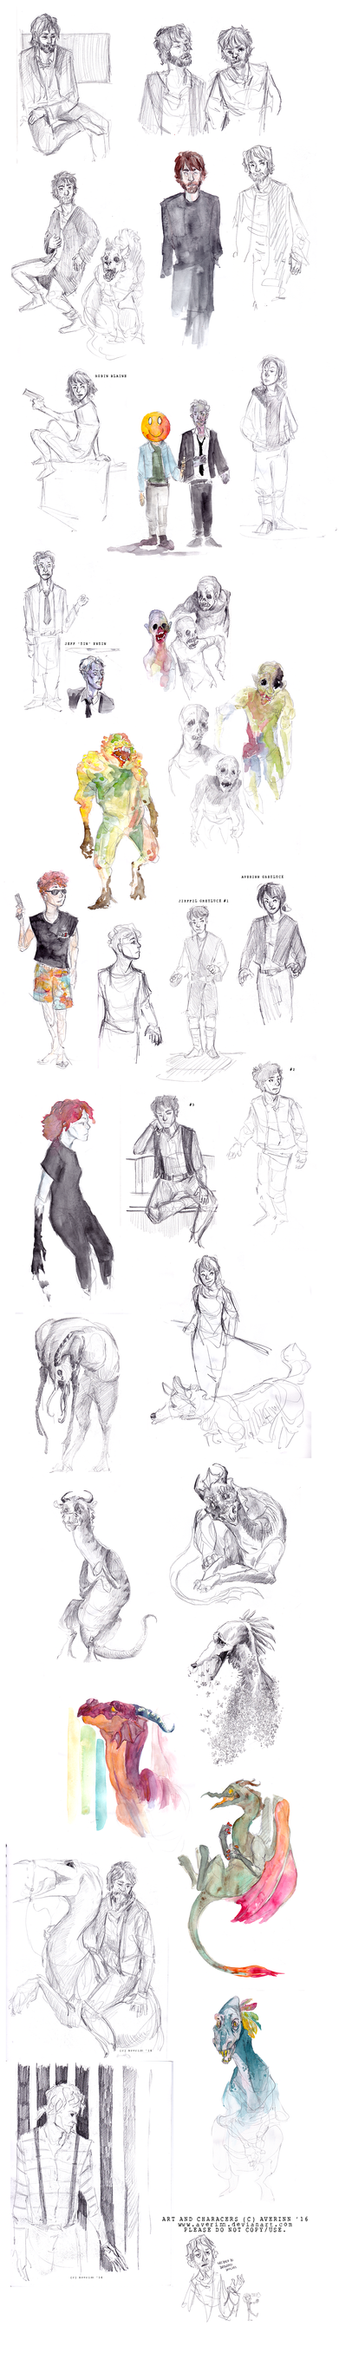 Sketchdump 003 by Averinn